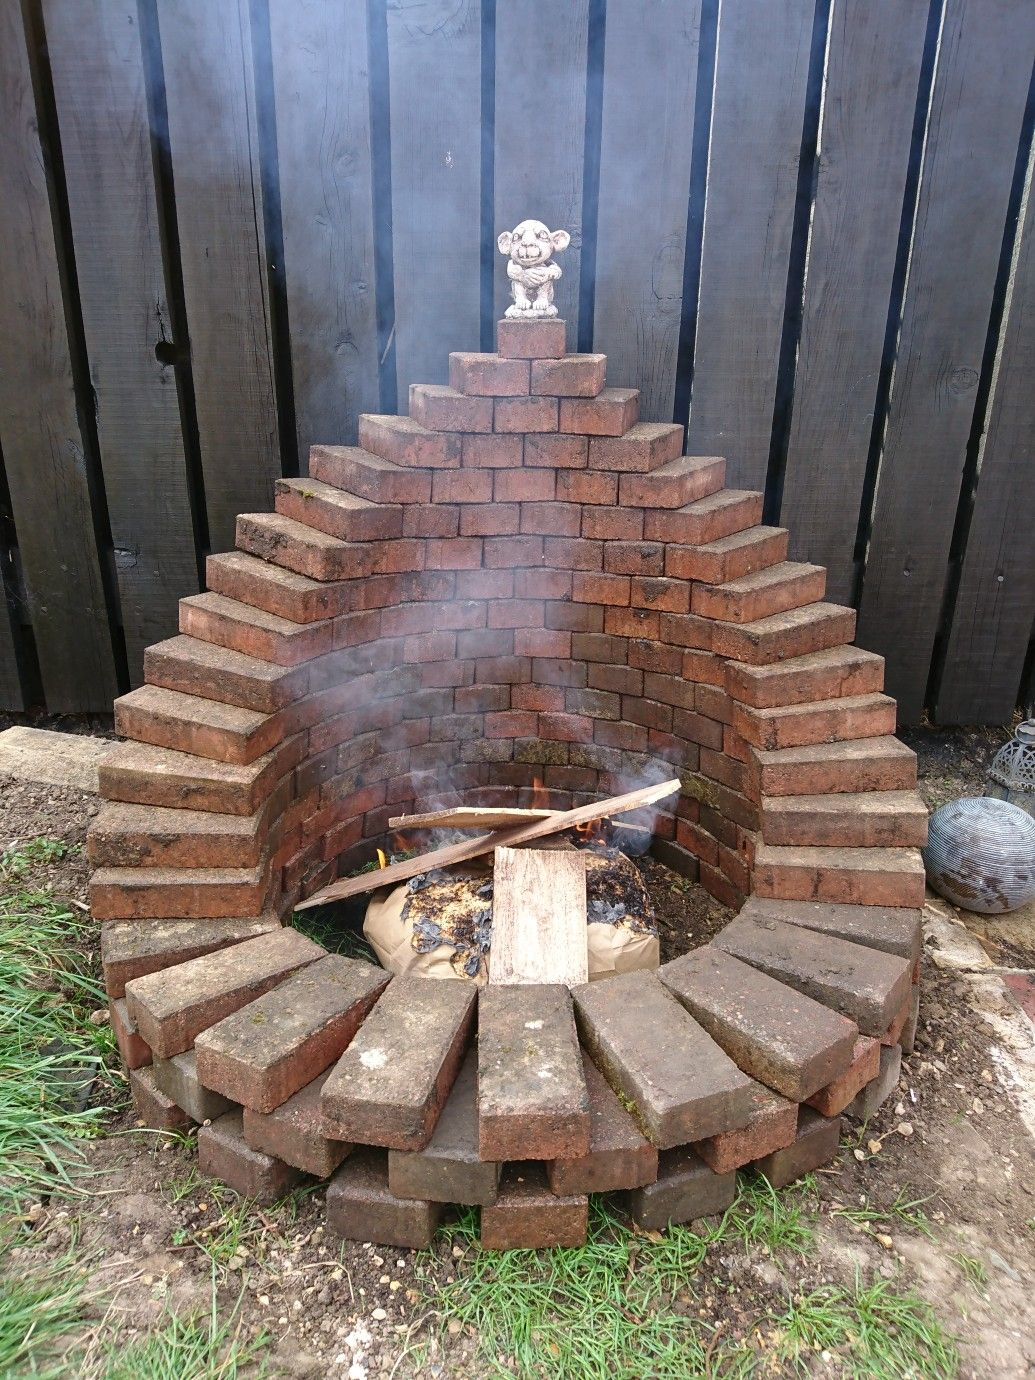 I made a fire pit from the garden paver path #feuerstellegarten